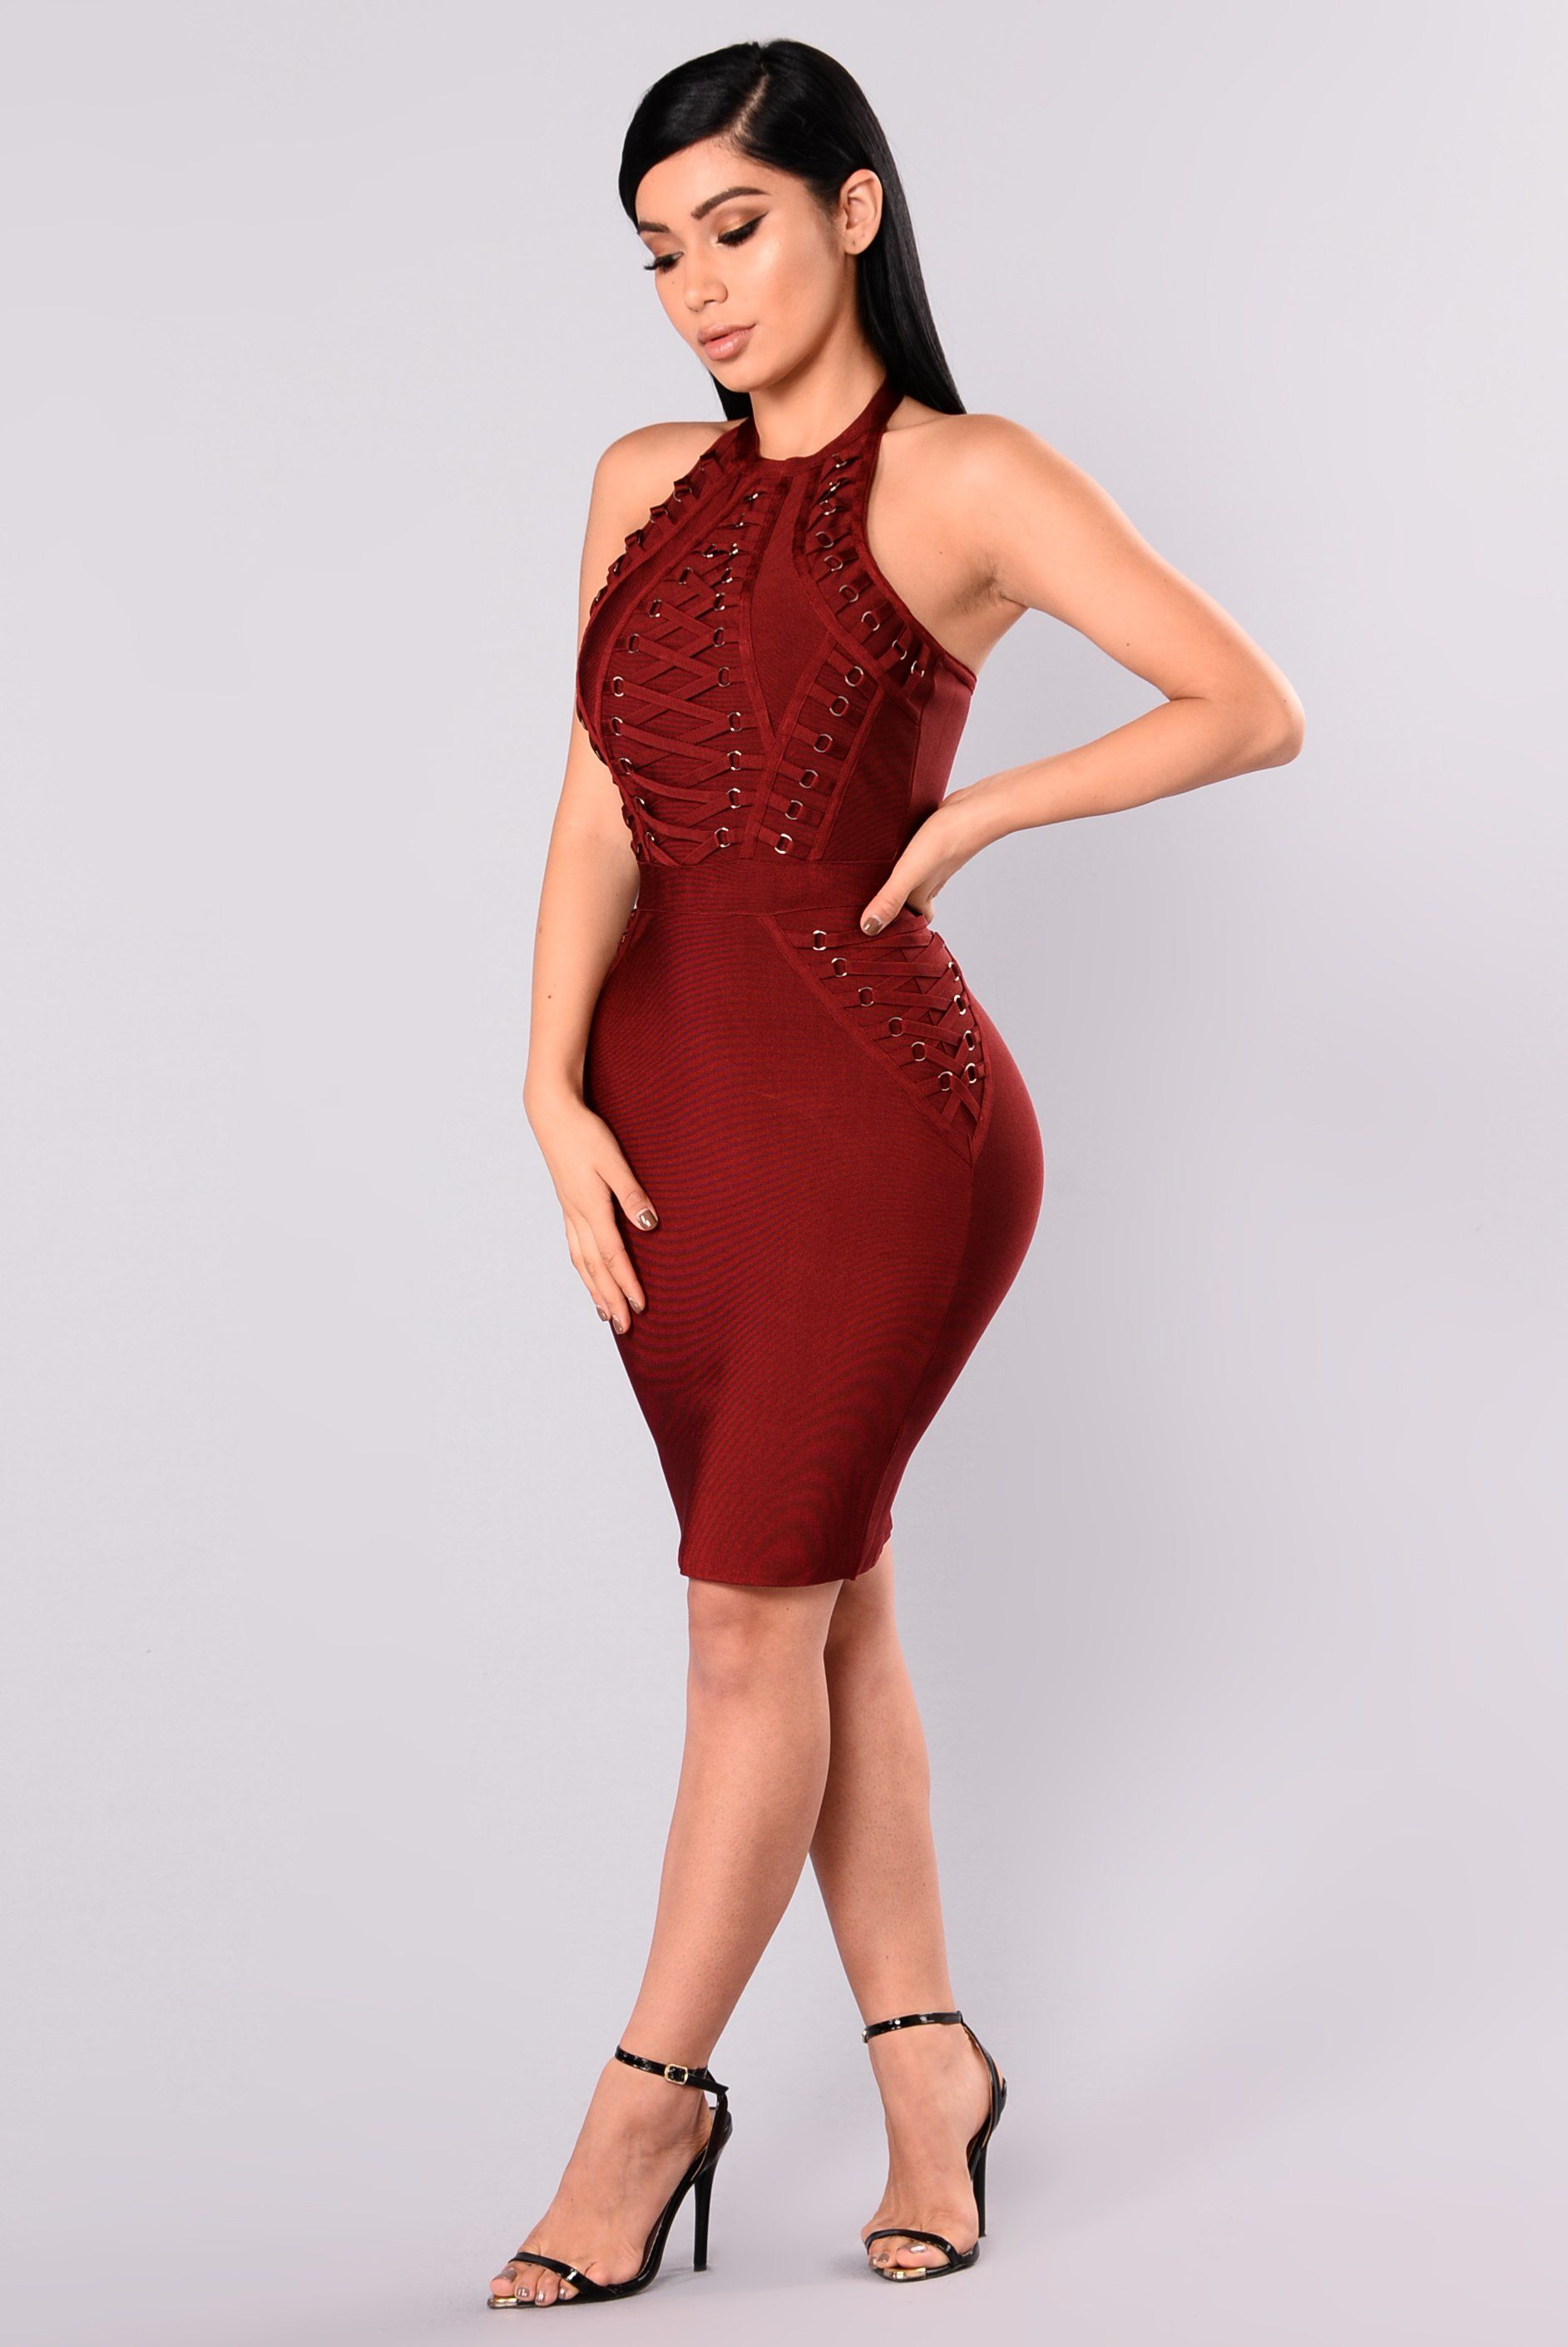 d50df0391b32 Peggy Bandage Dress - Burgundy in 2019 | Fashion Nova | Dresses ...